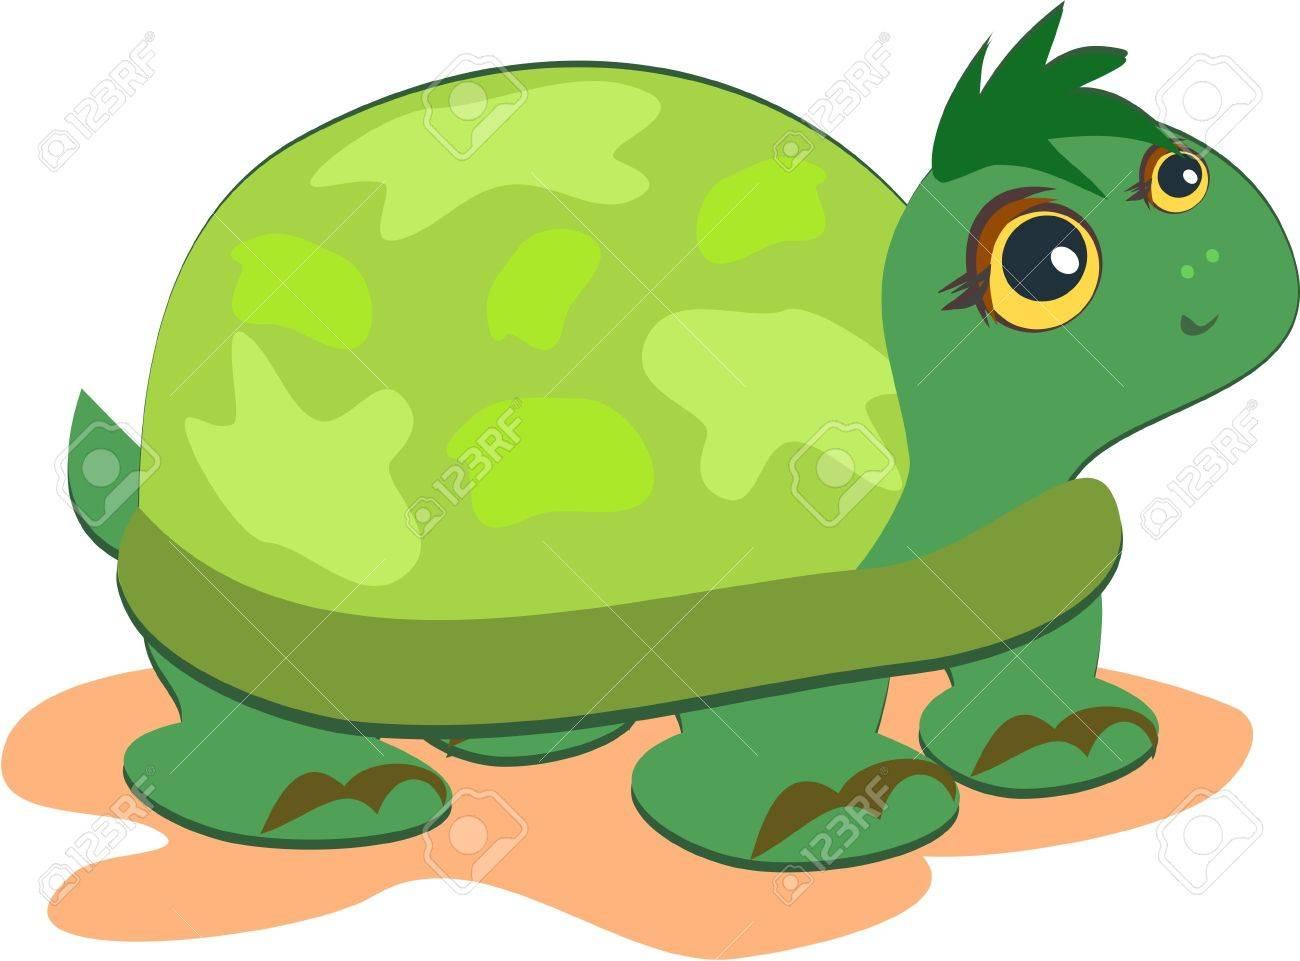 Cute Green Turtle Stock Vector - 10784862